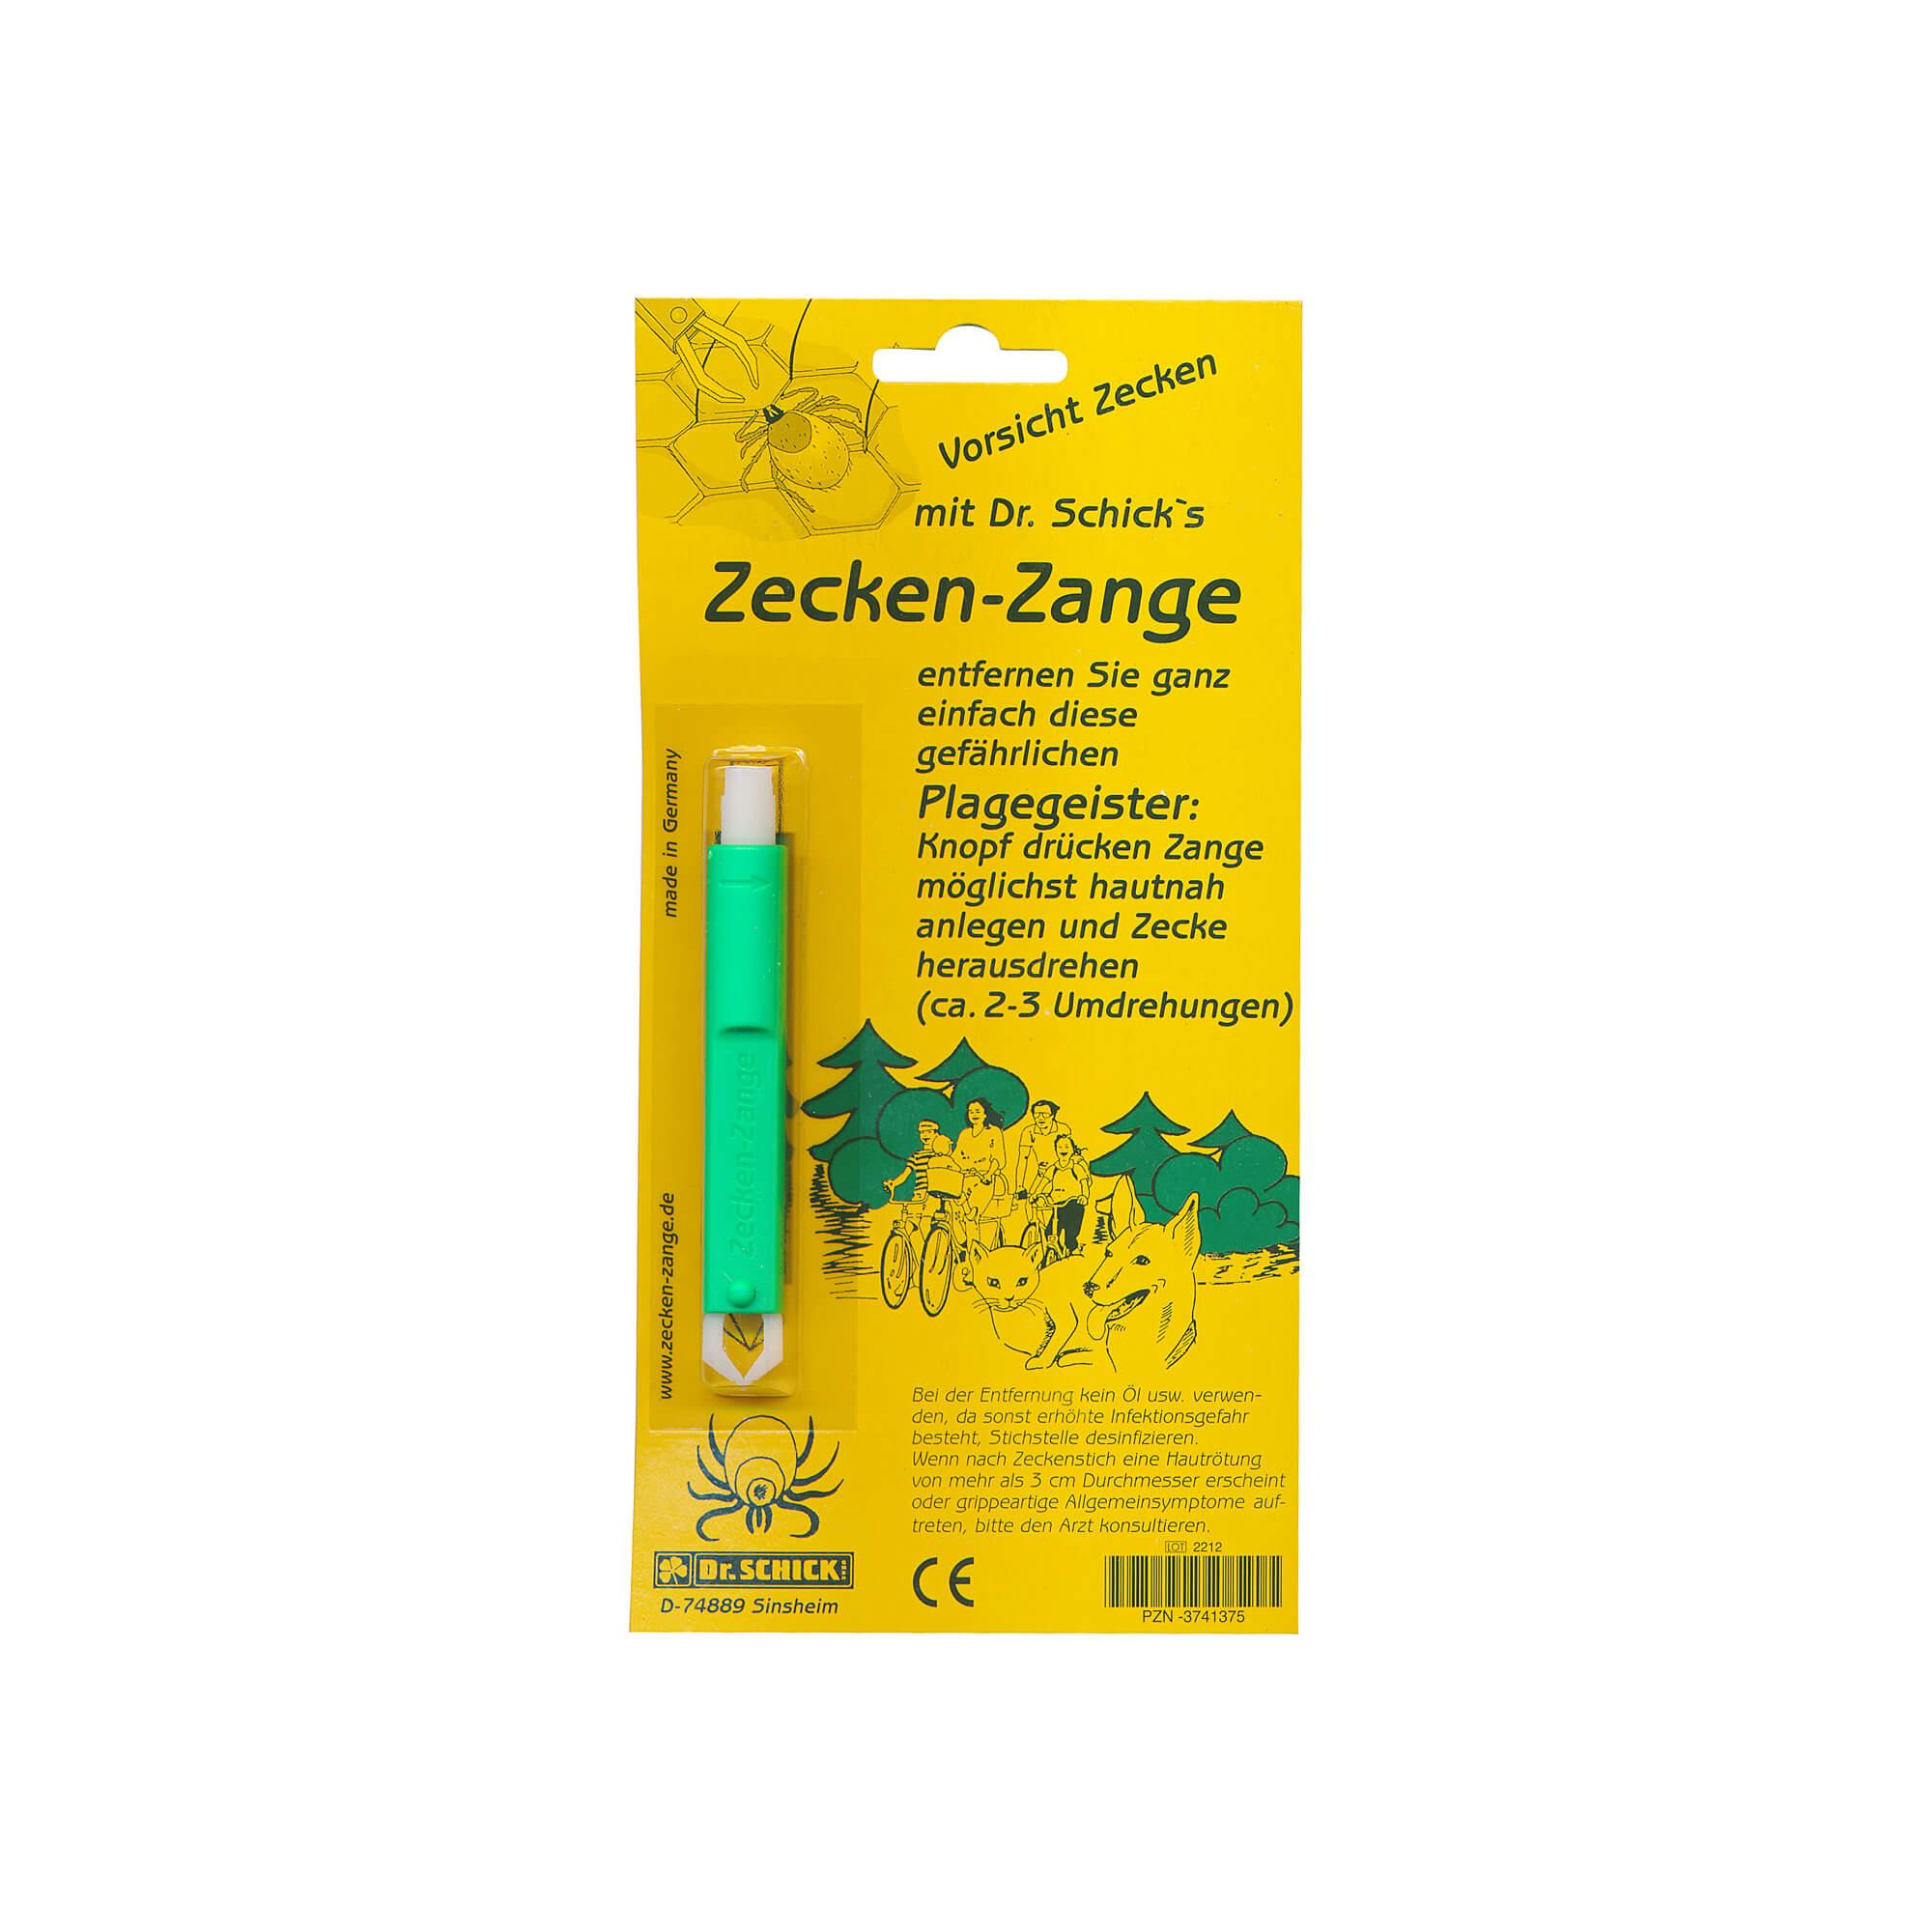 Zecken Zange